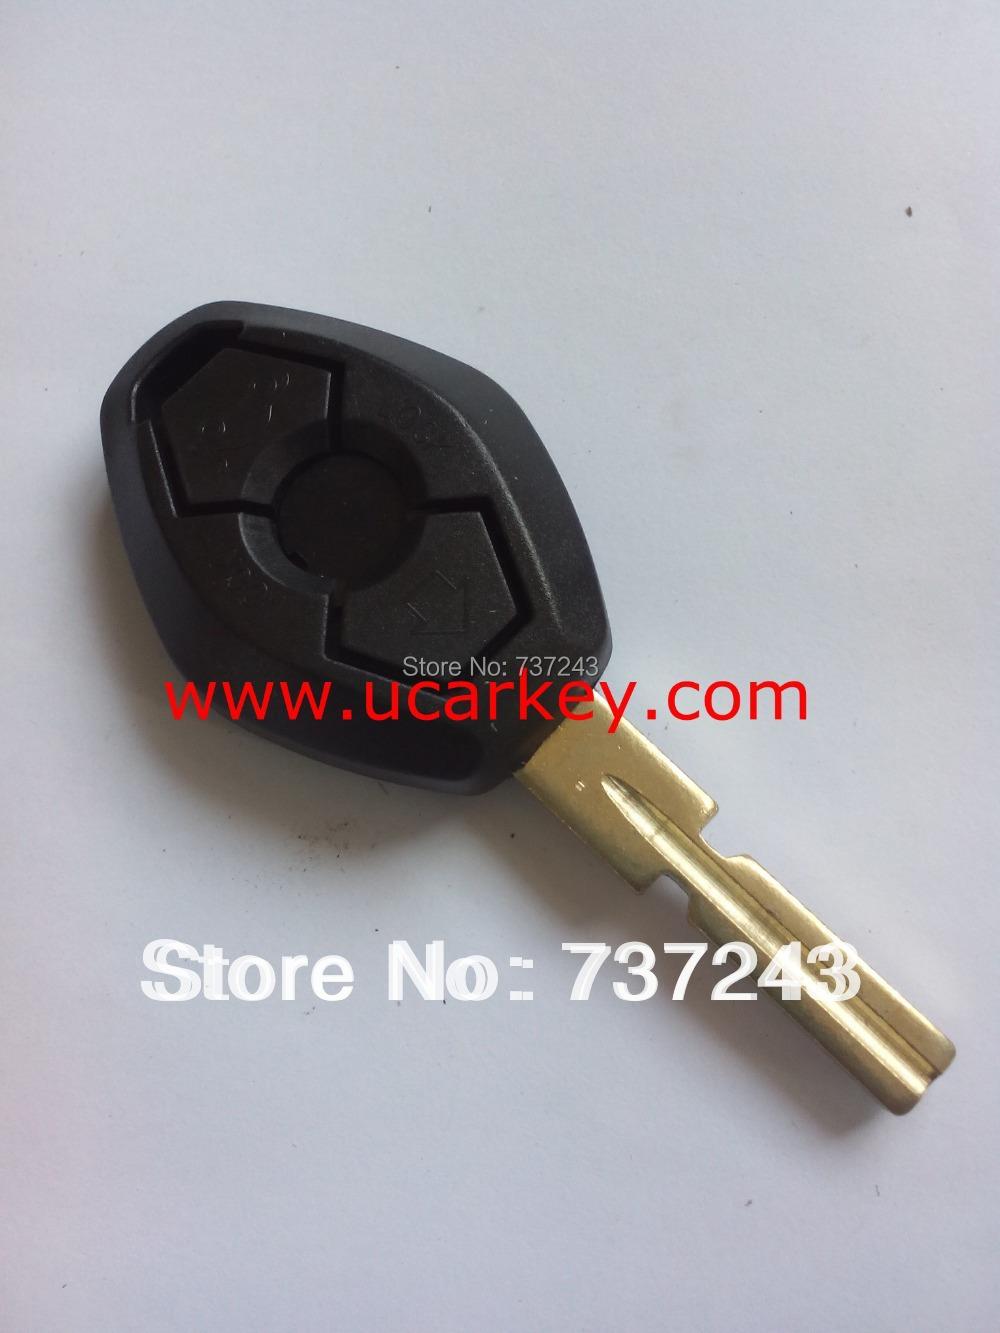 4 track for bmw remote key case /key blank &key case for bmw& for bmw flip key blank FOB price with high quality(China (Mainland))